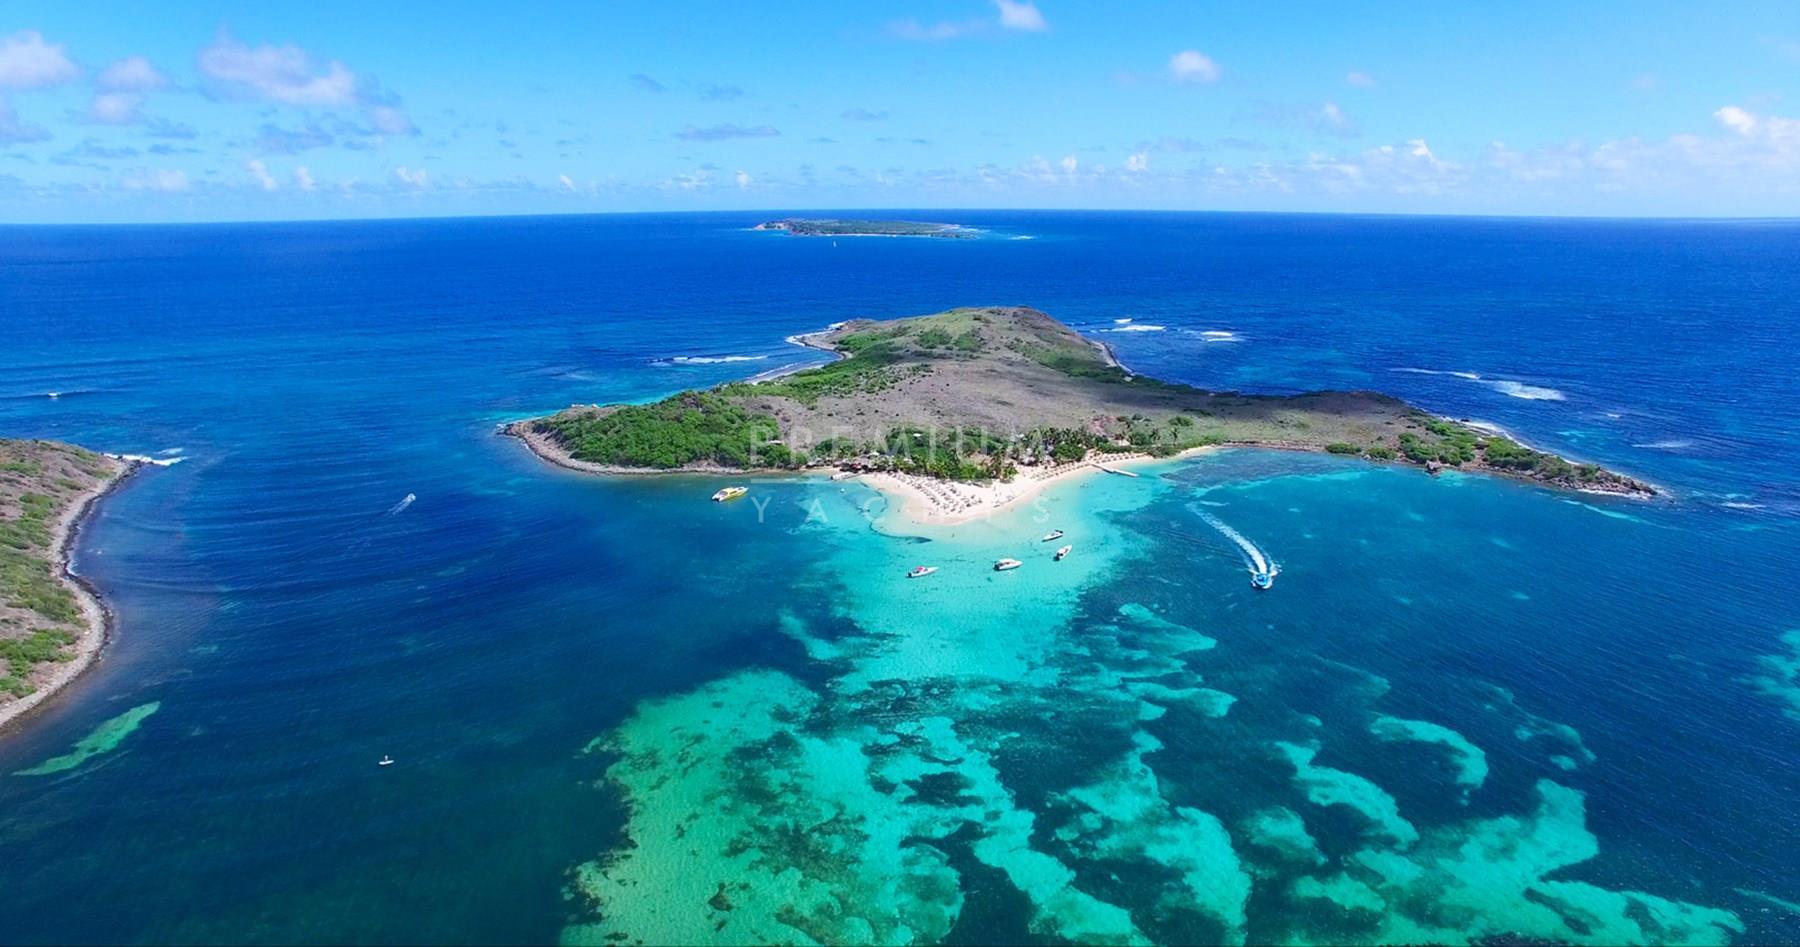 Pinel island